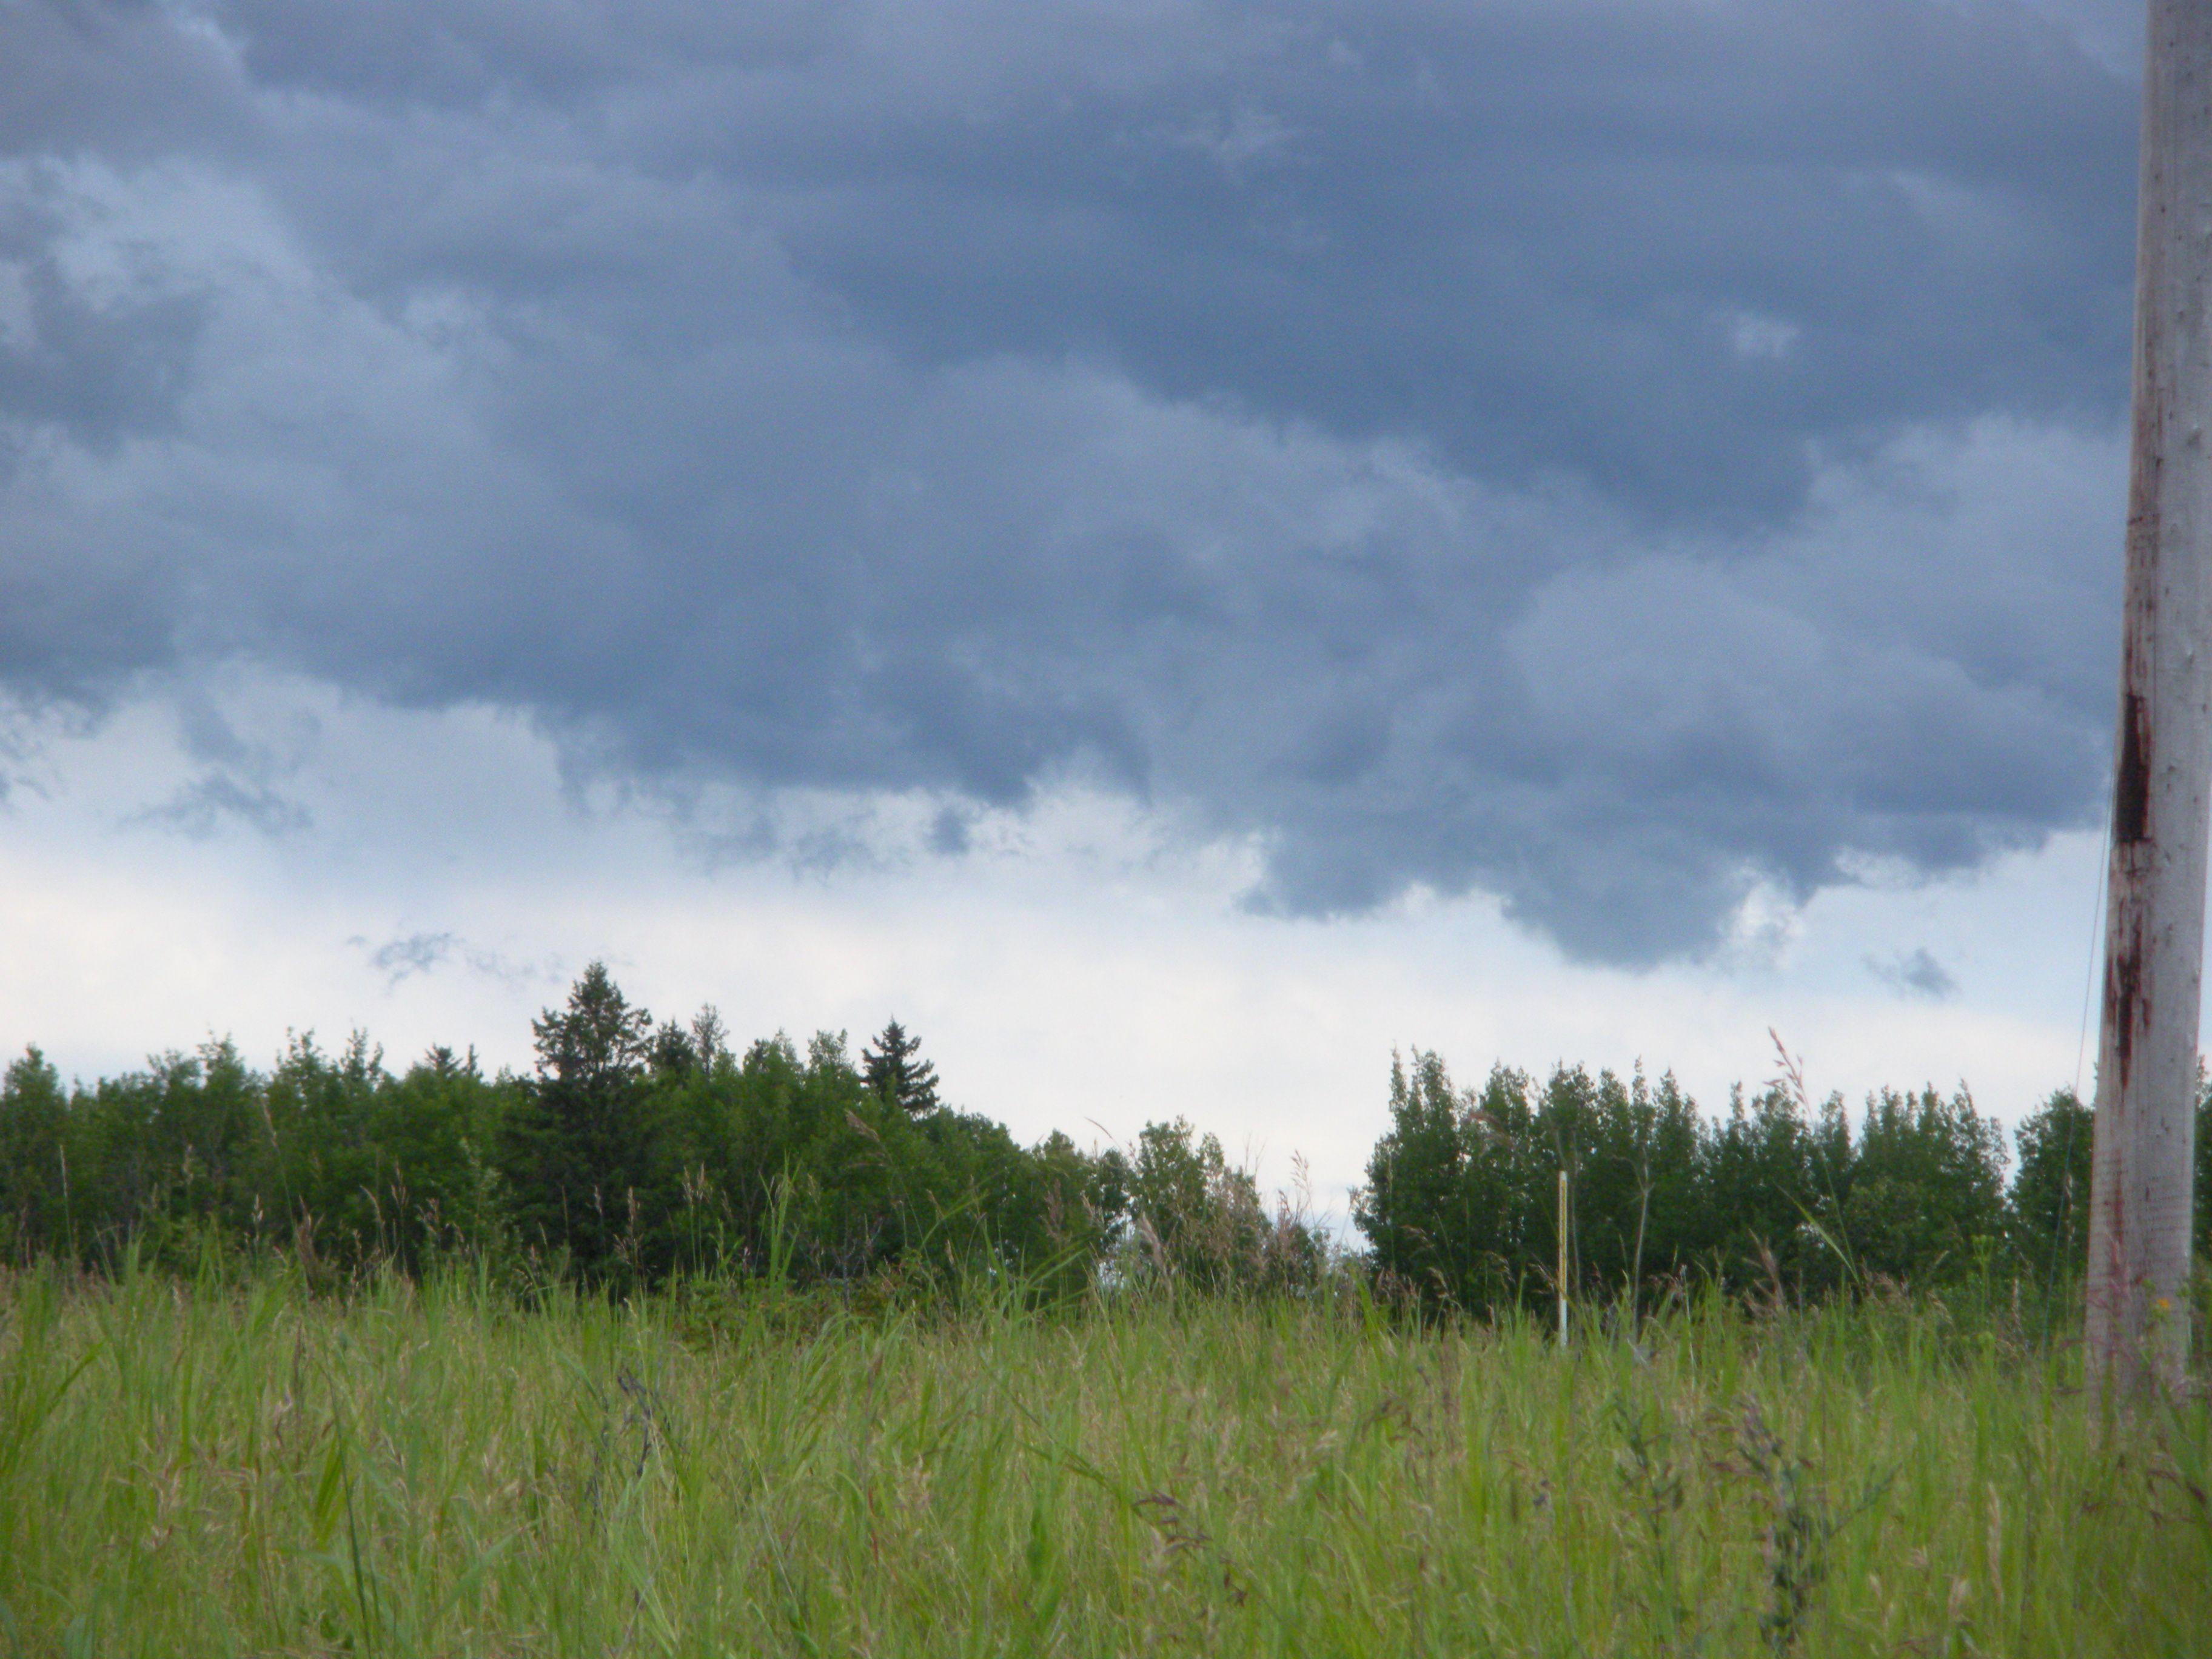 Storm lurking...